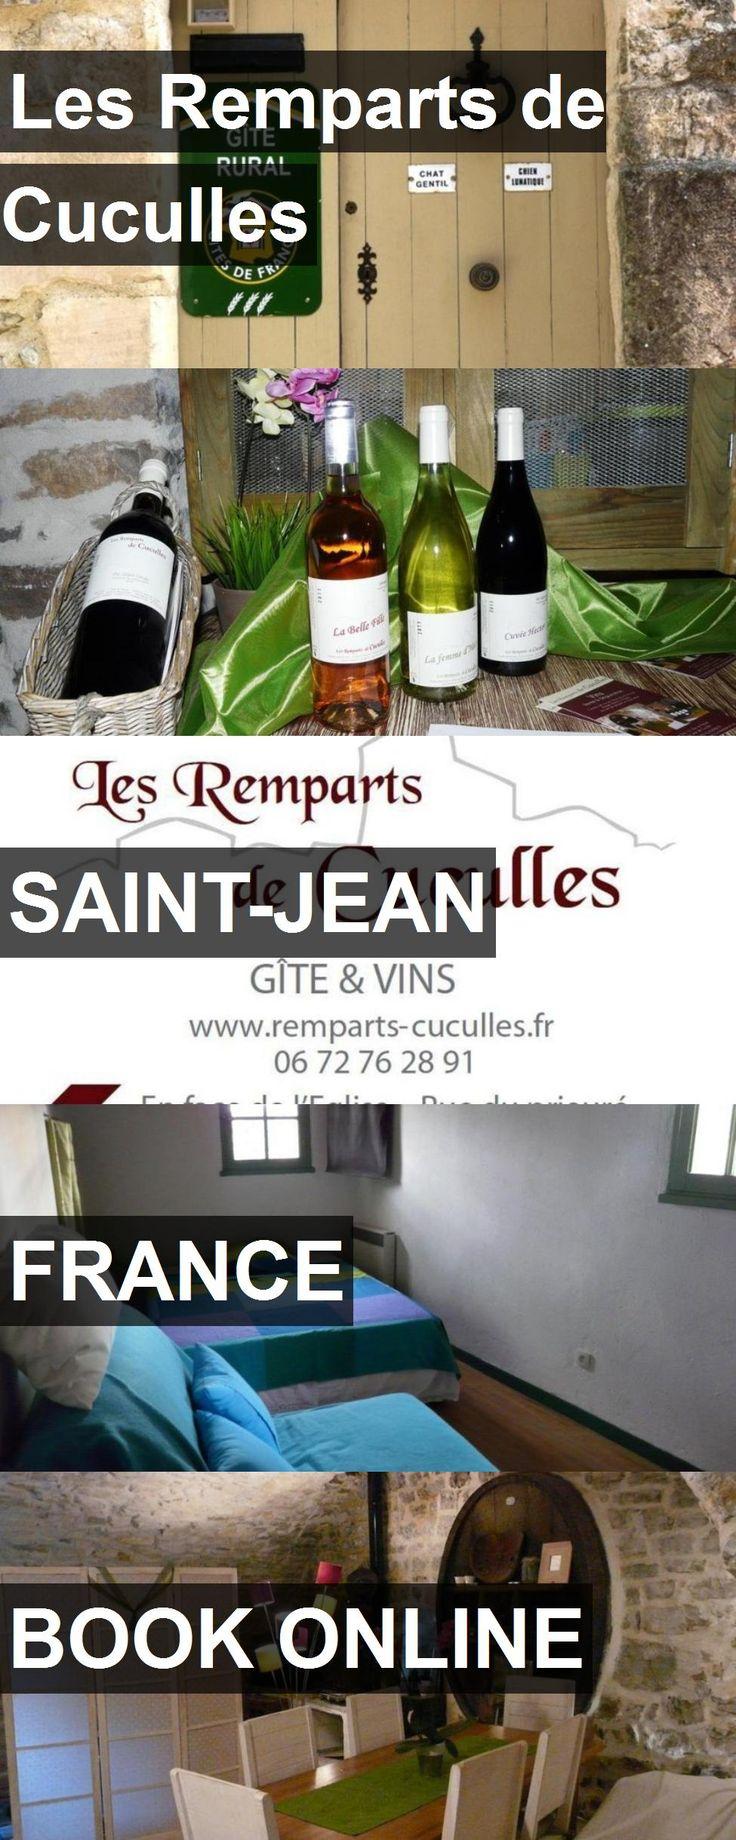 Hotel Les Remparts de Cuculles in Saint-Jean, France. For more information, photos, reviews and best prices please follow the link. #France #Saint-Jean #LesRempartsdeCuculles #hotel #travel #vacation